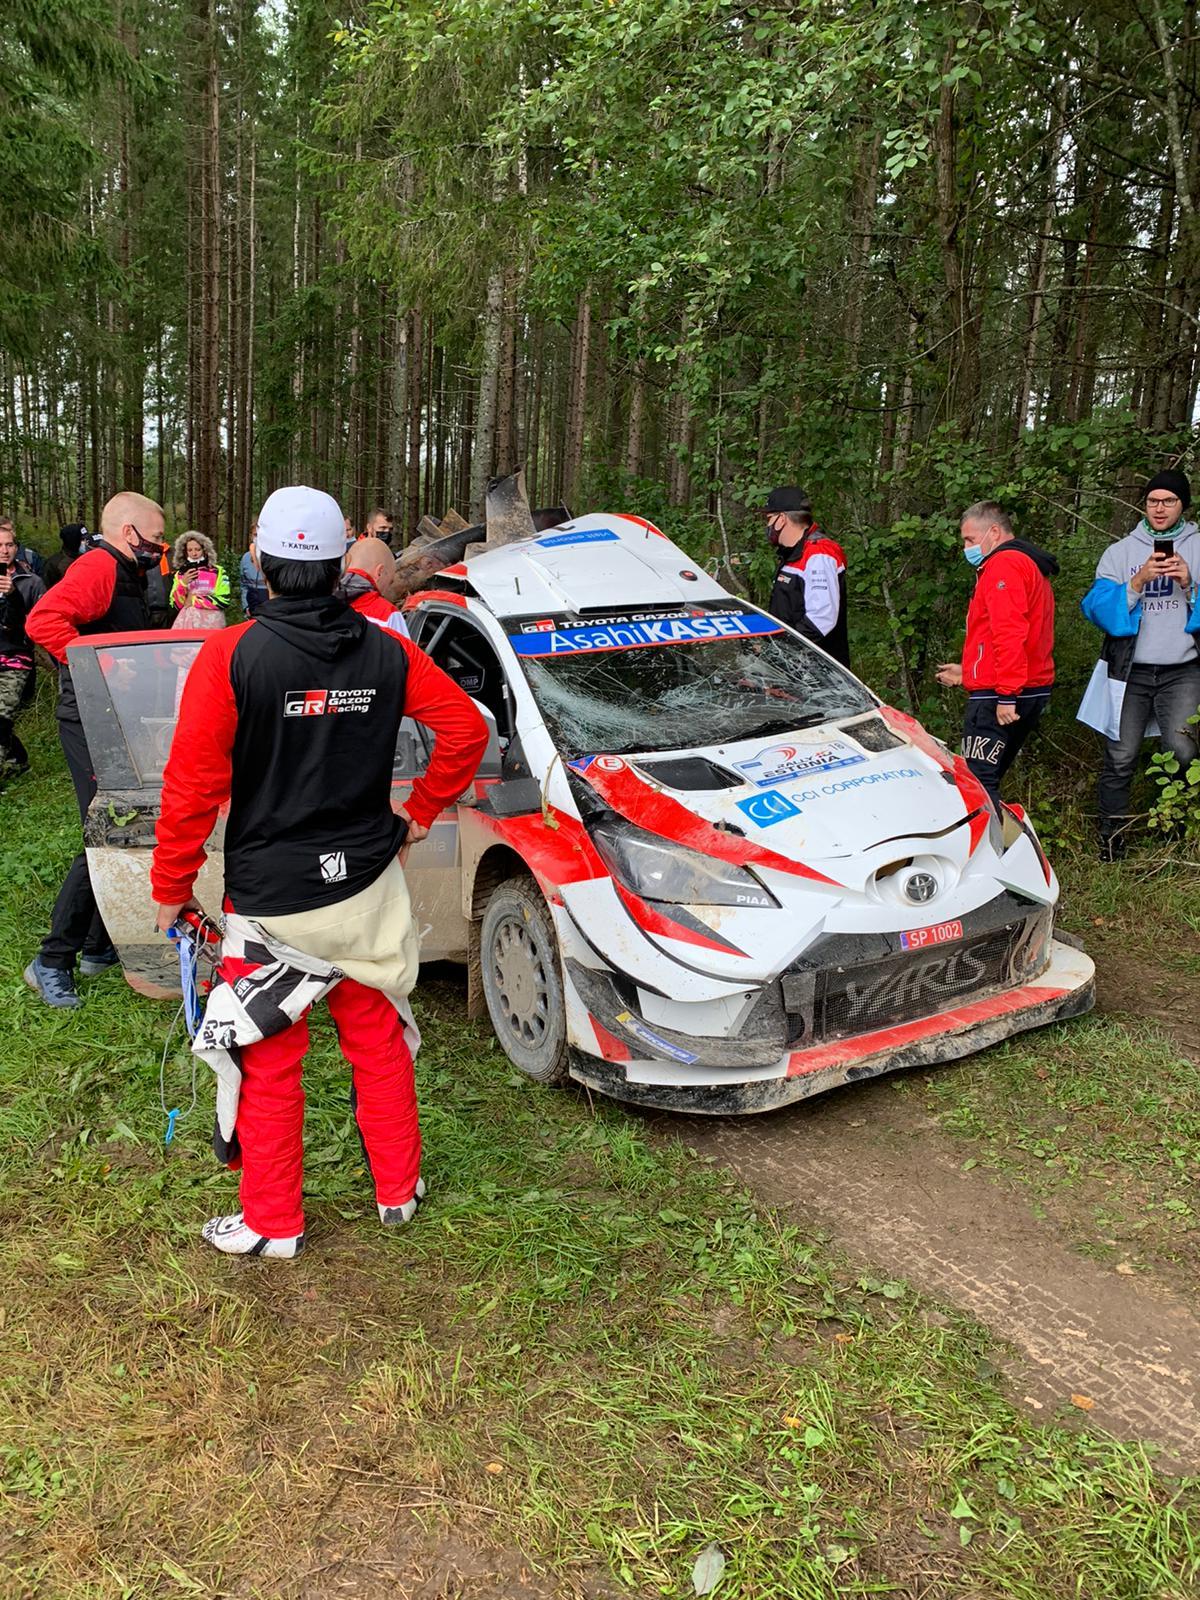 WRC: 10º Rallye Estonia [4-6 Septiembre] - Página 7 EhN6QQtWoAEPinw?format=jpg&name=large